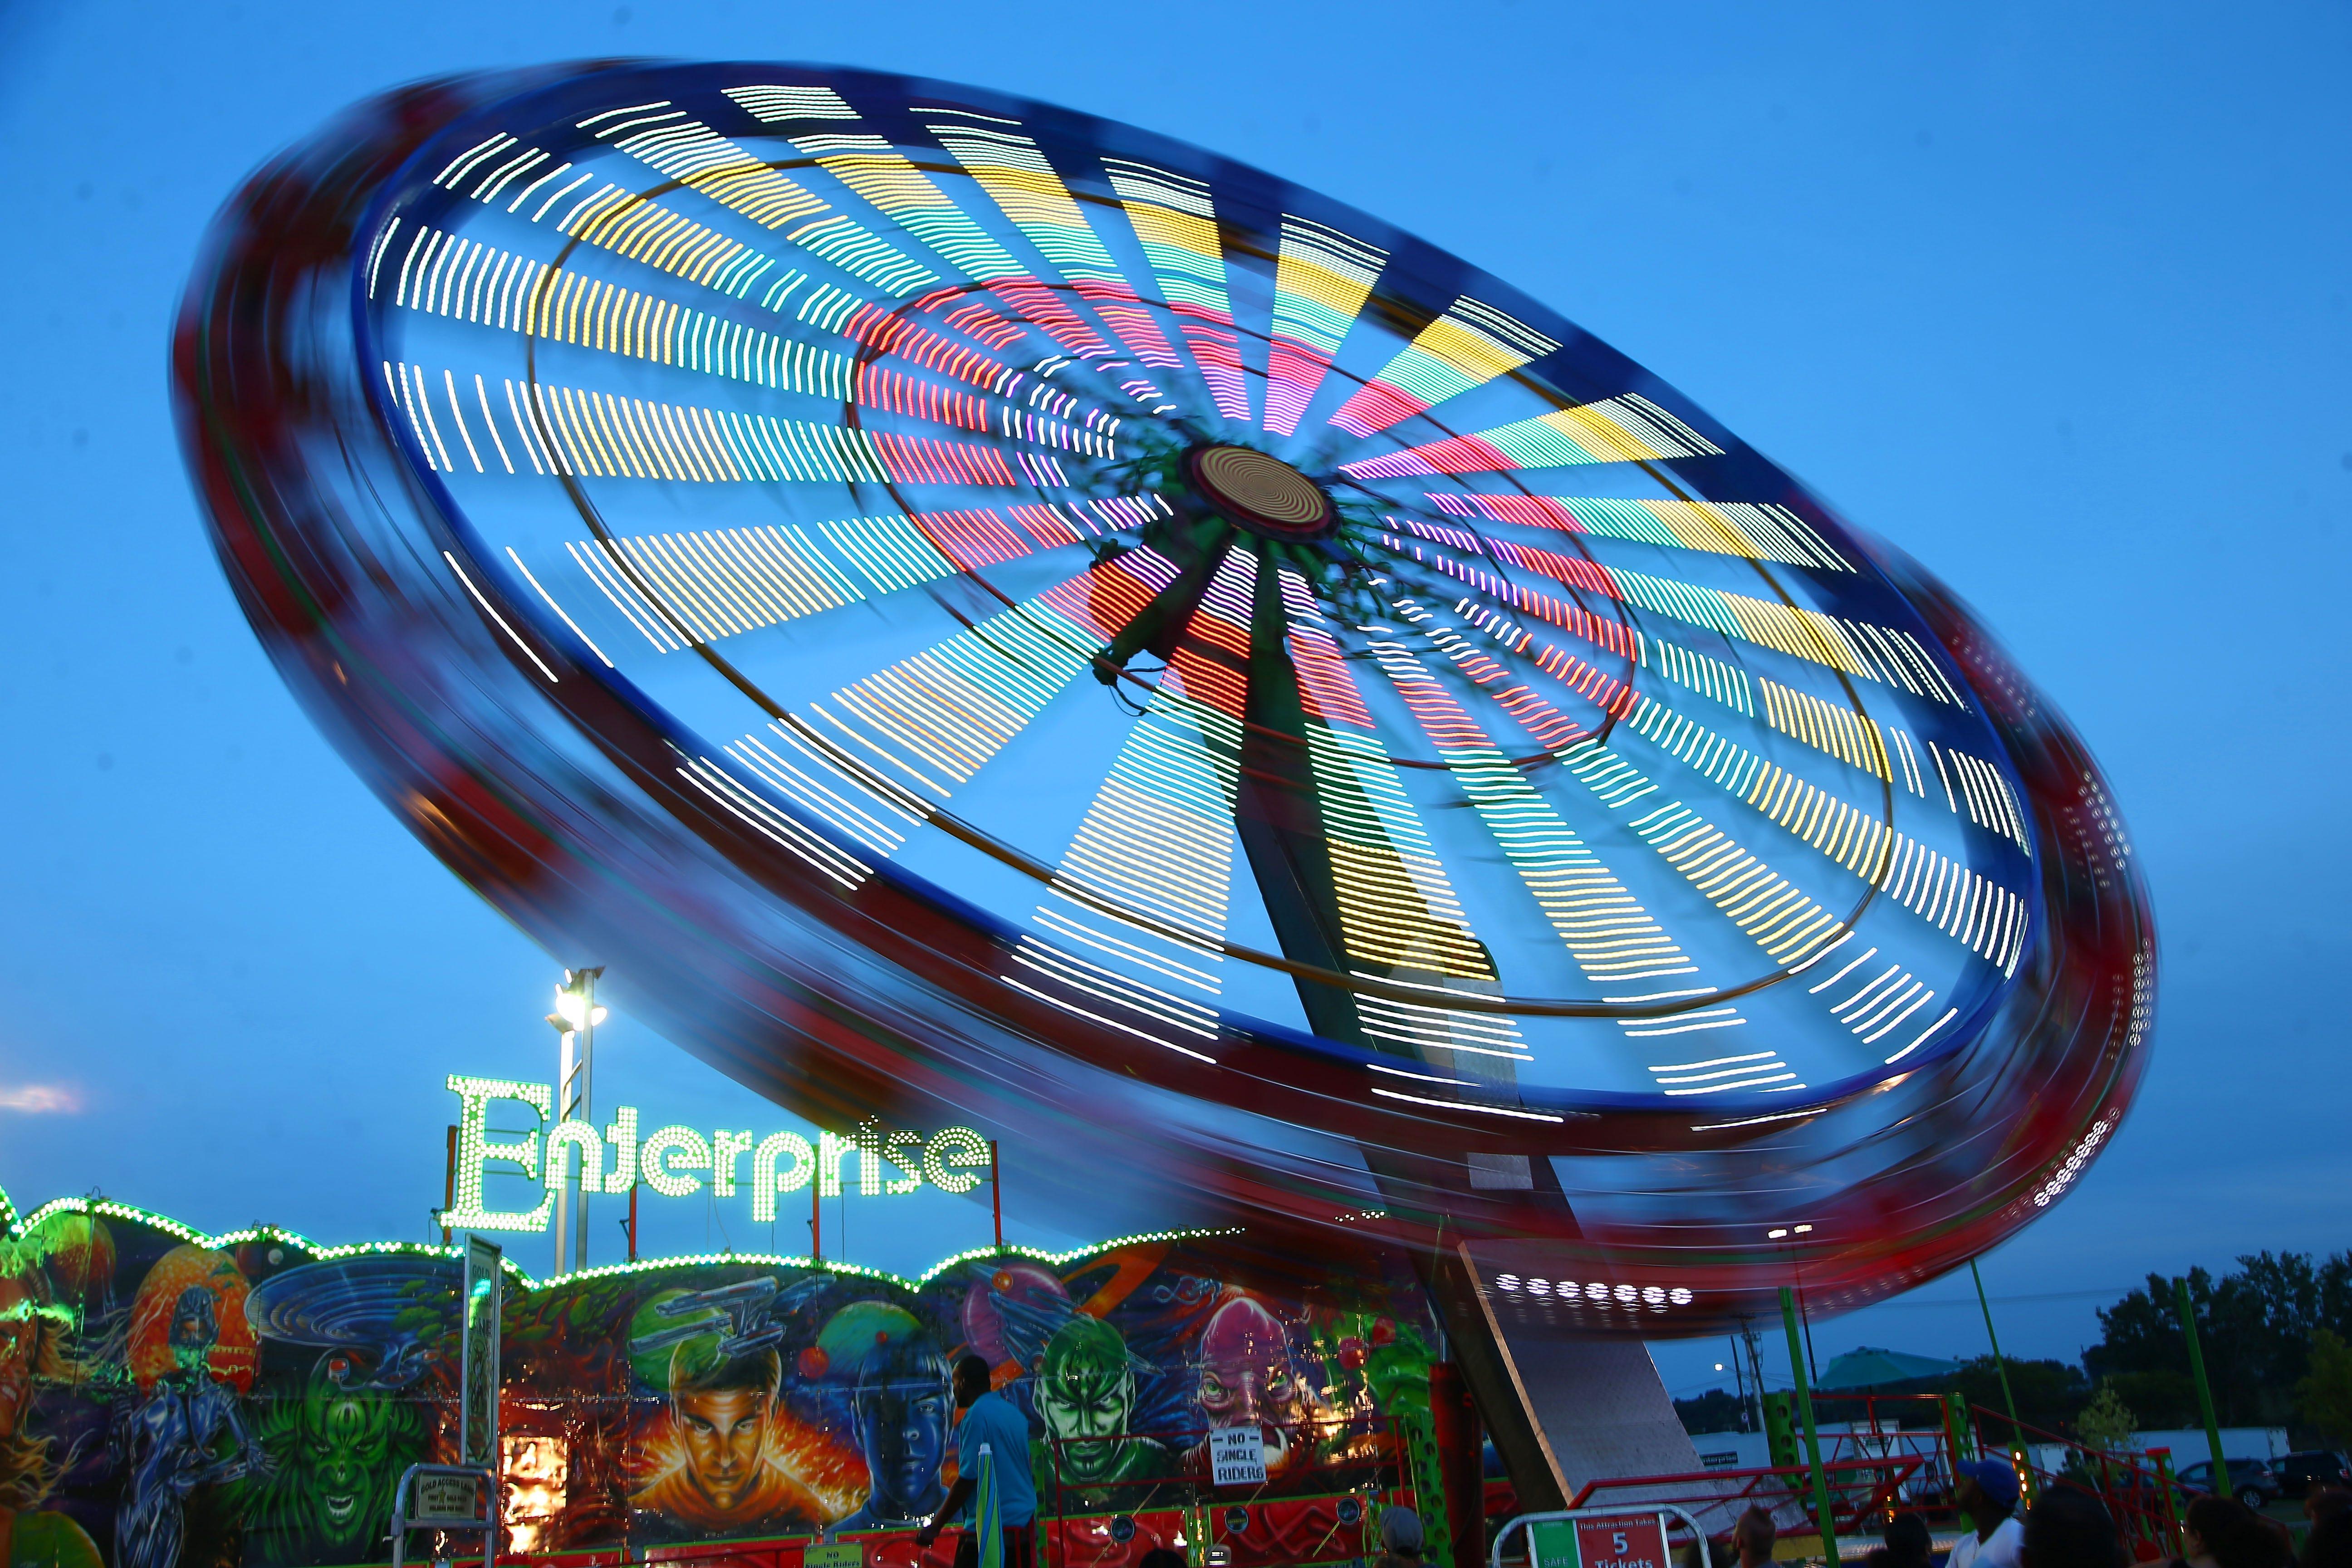 Syracuse state fair rides prizes